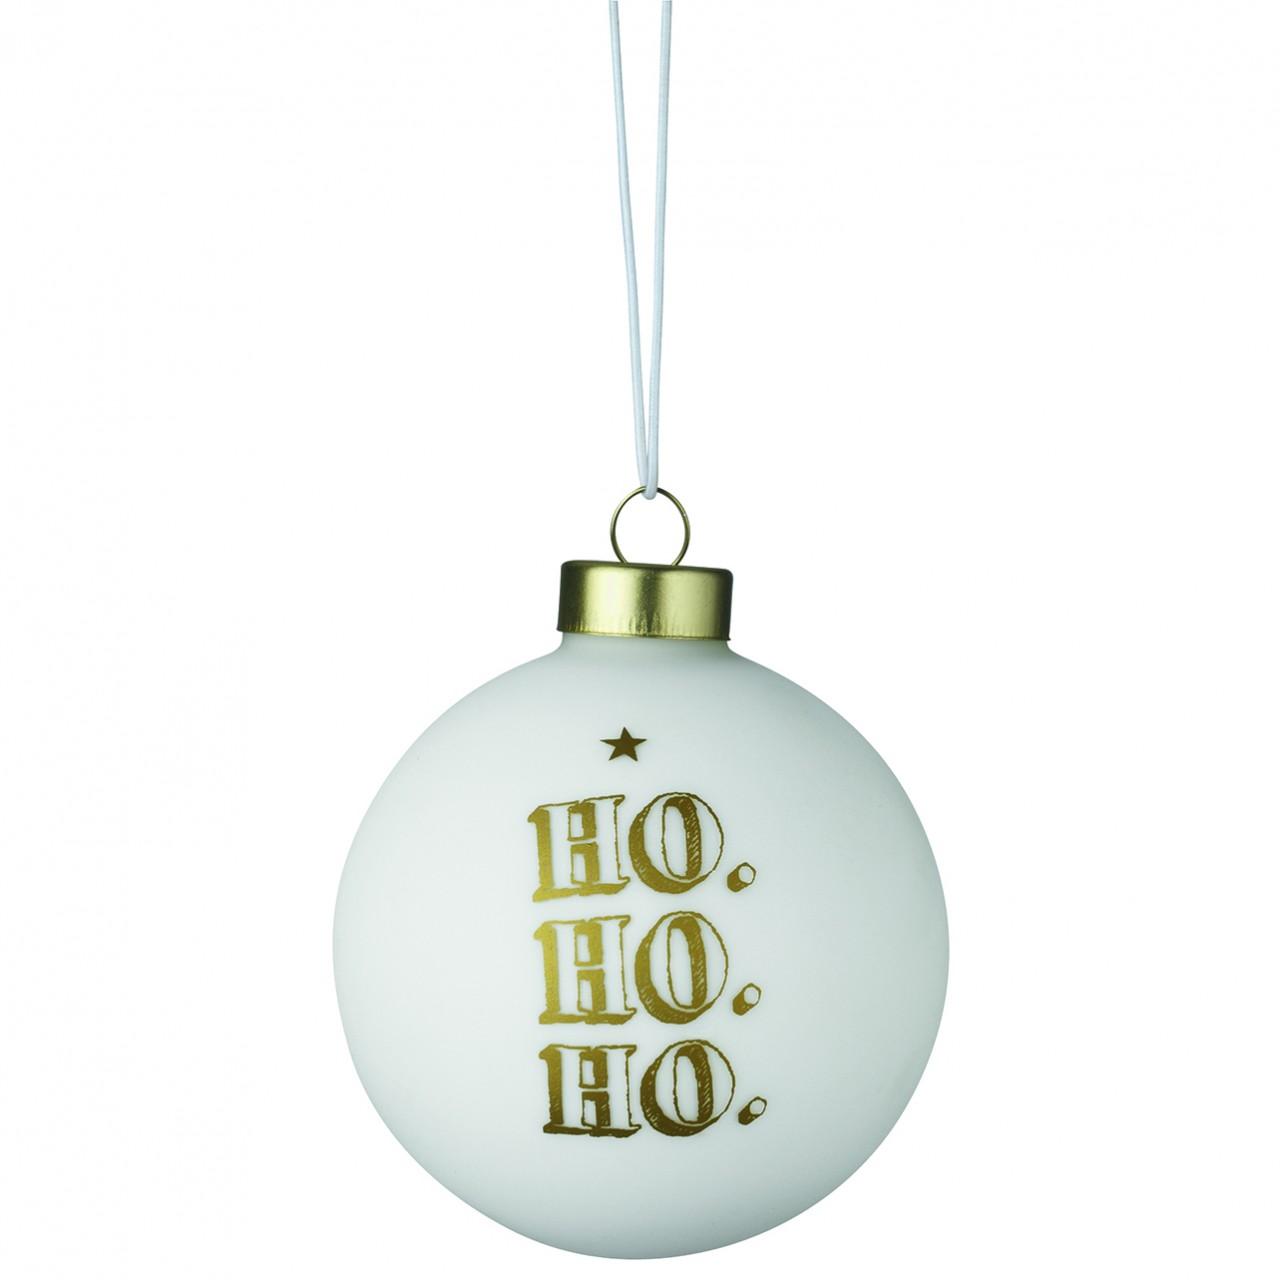 Räder Weihnachtskugeln.Räder Weihnachtskugel Ho Ho Ho Weiss Gold